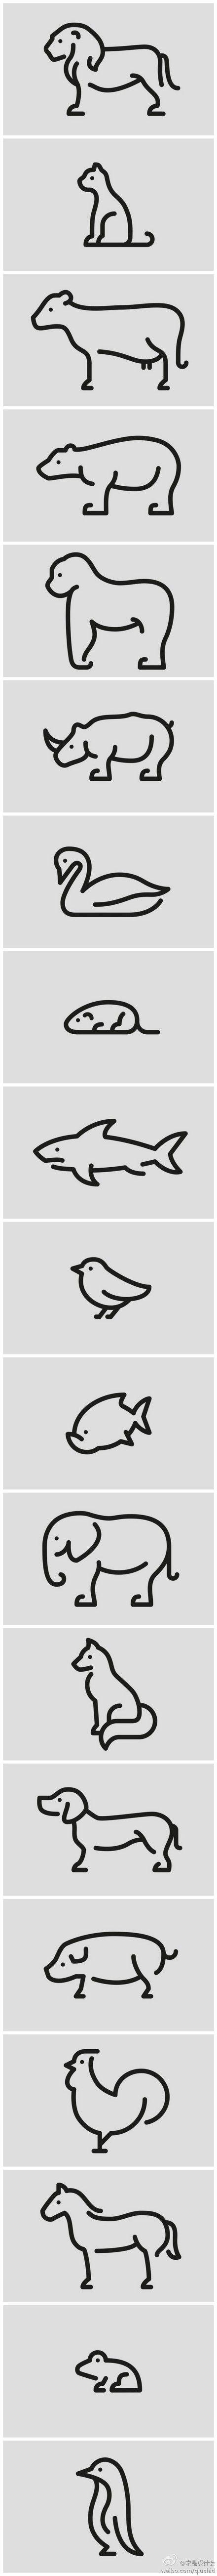 animal icons - line art